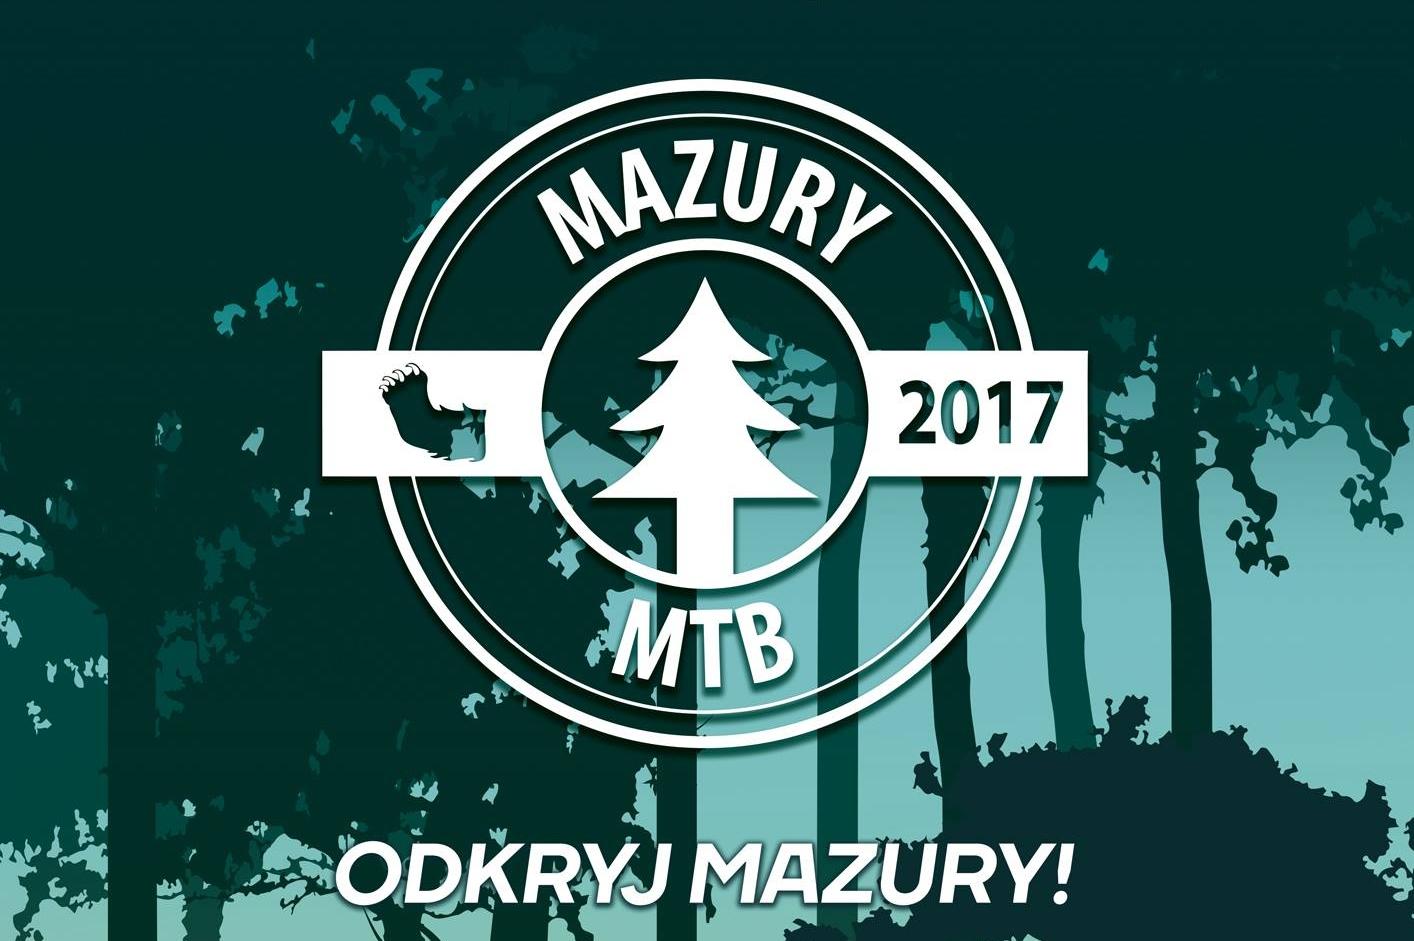 Kalendarz Mazury MTB 2017